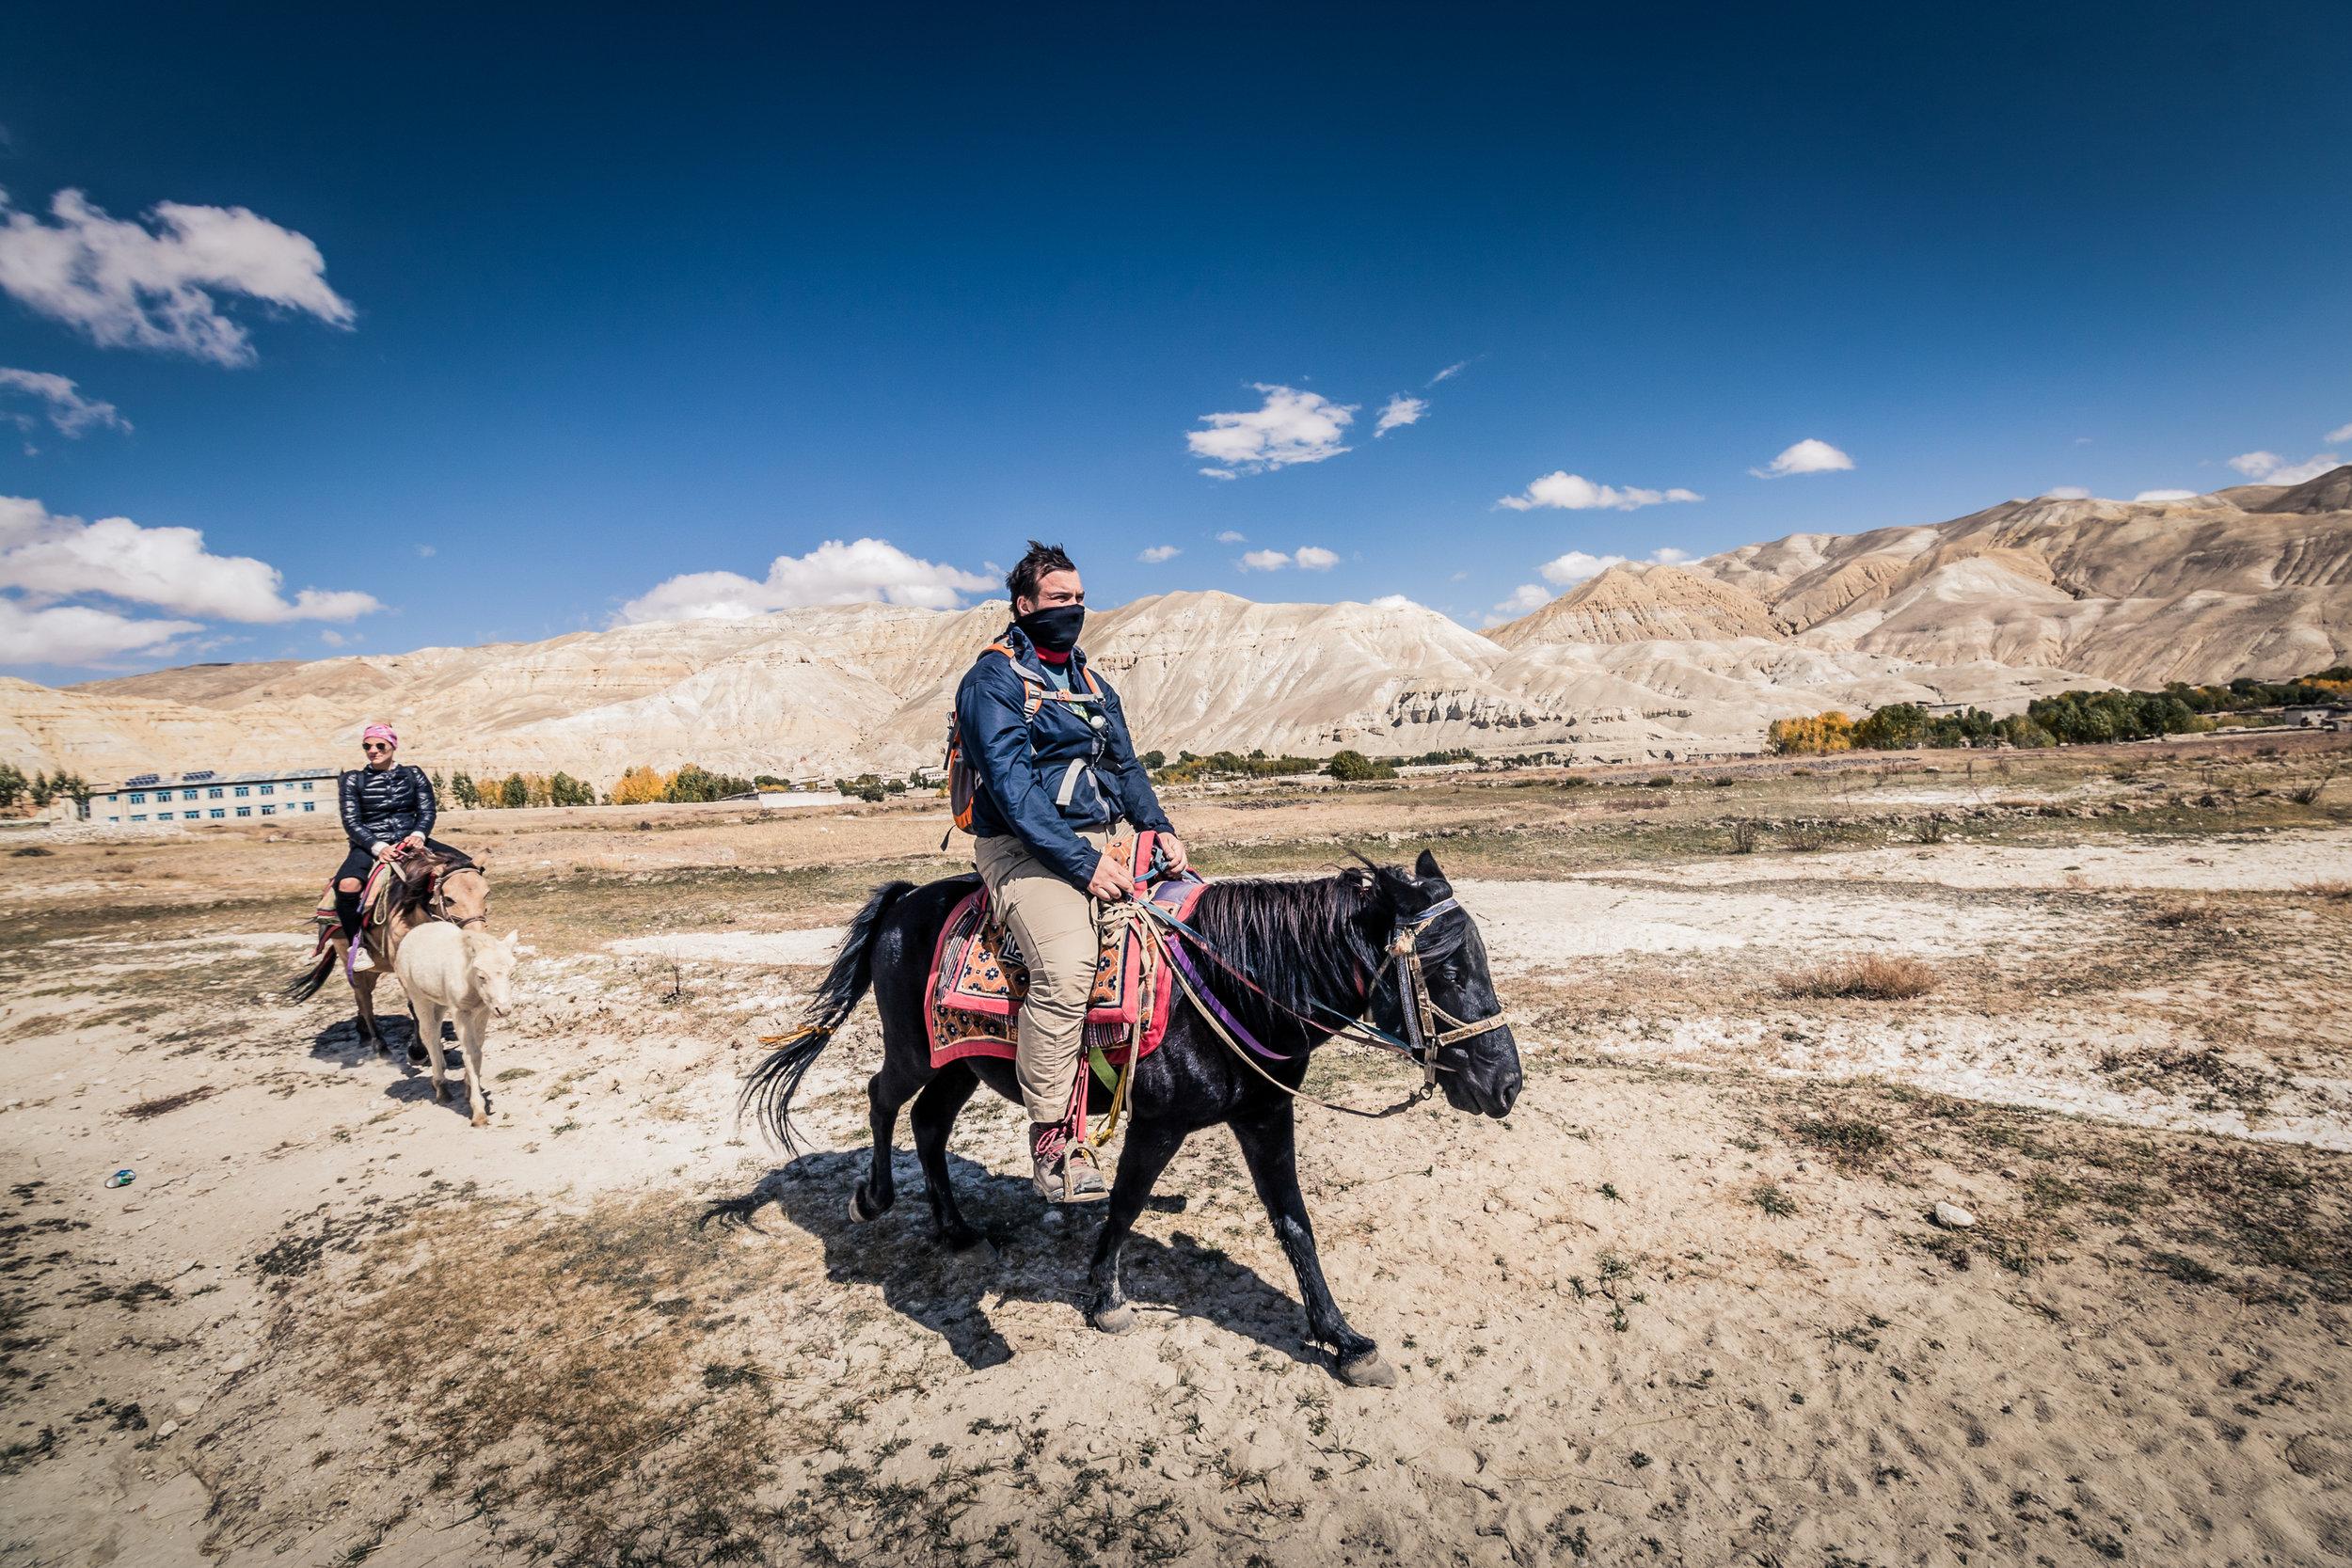 TWHMC-nepal-motorcycle-adventure-2016-0435-2.jpg